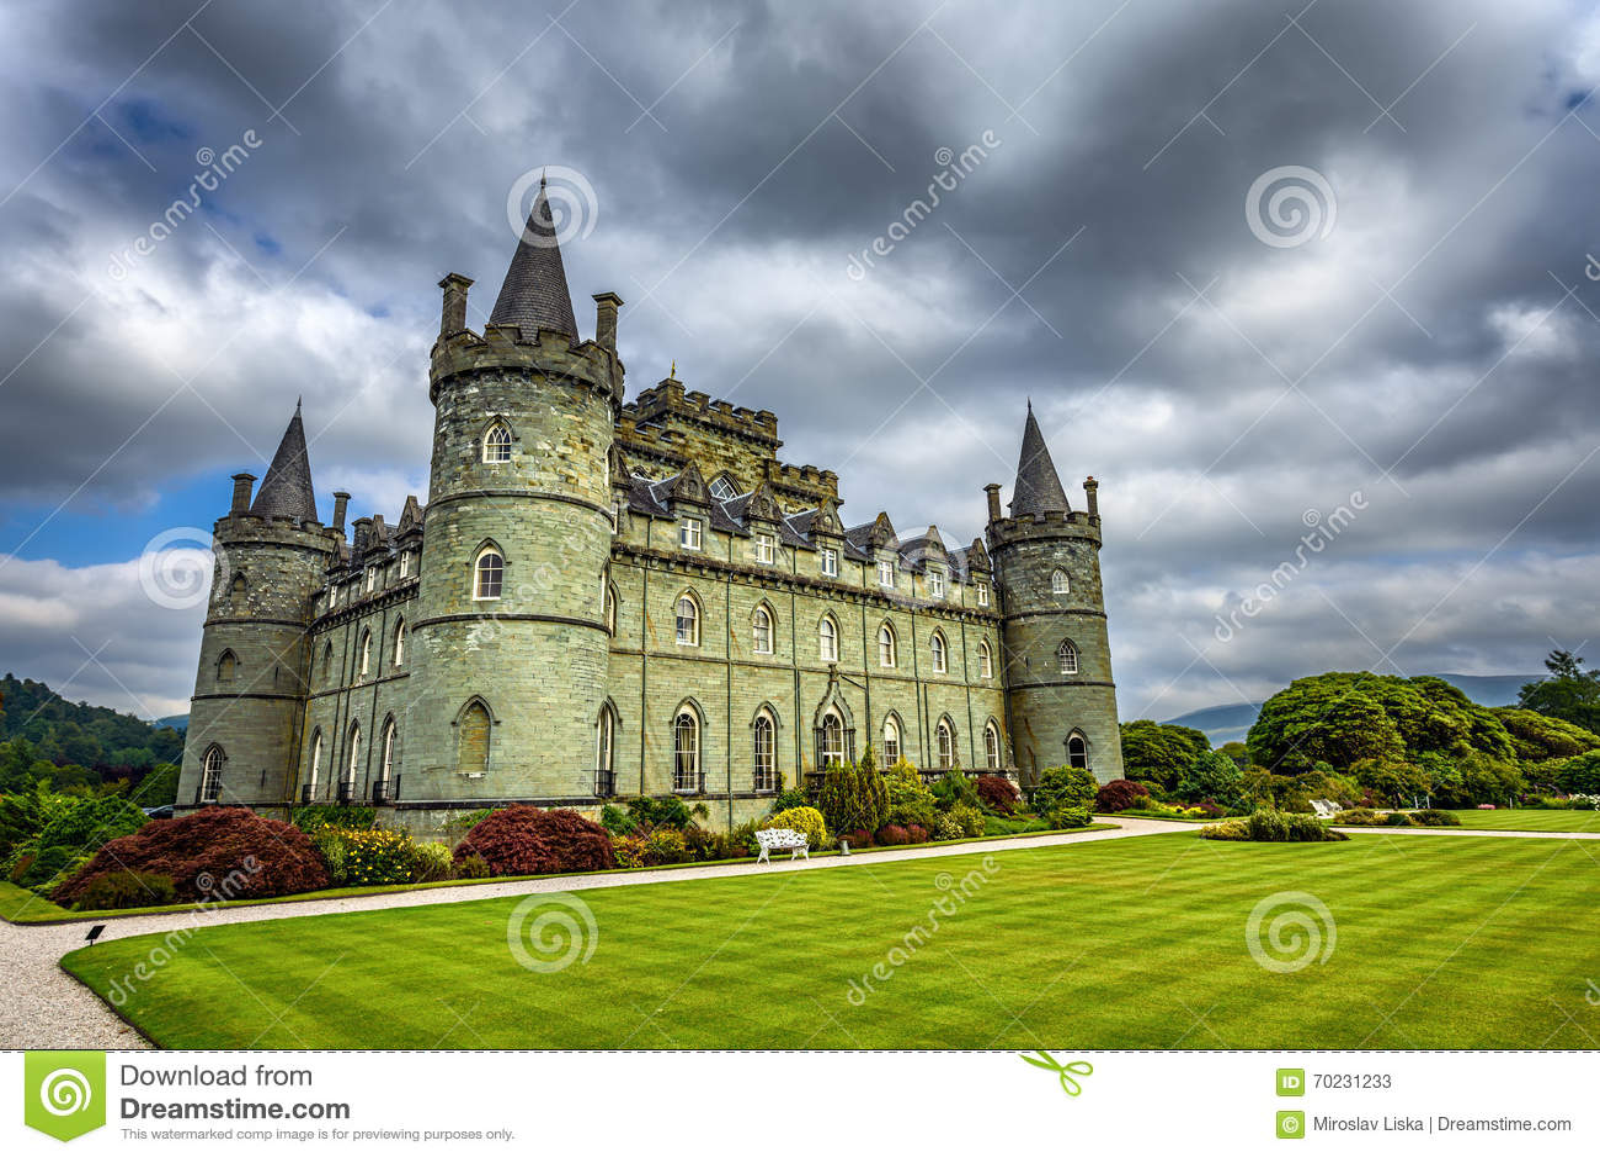 Castillo de inveraray en escocia occidental reino unido for Le chateau le plus beau du monde